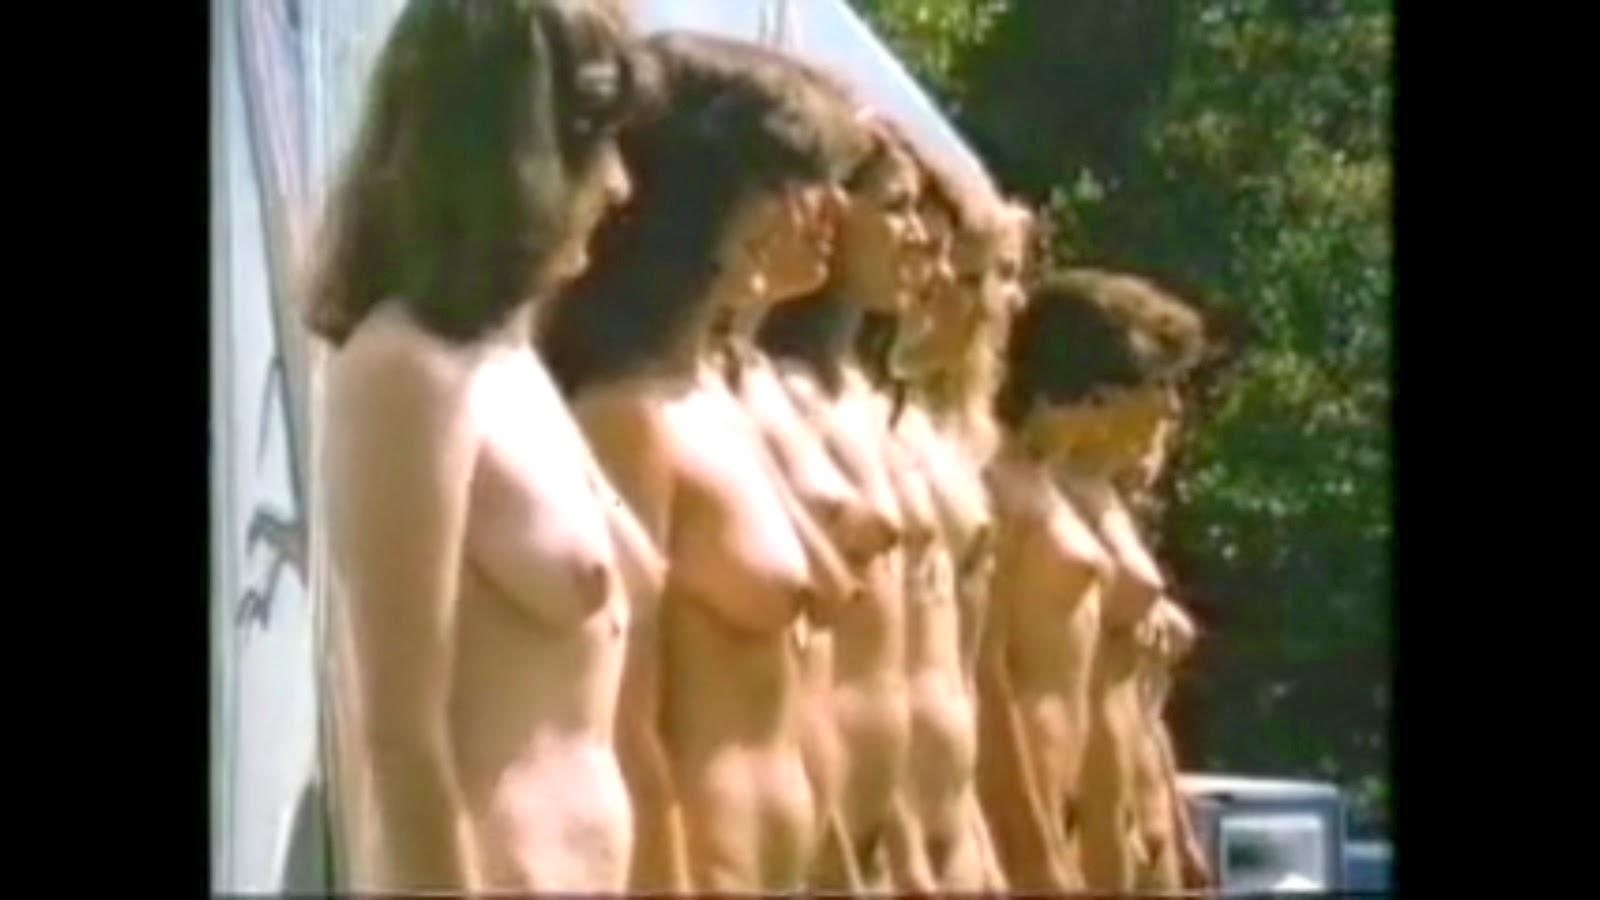 Watch abi titmuss sex tape online